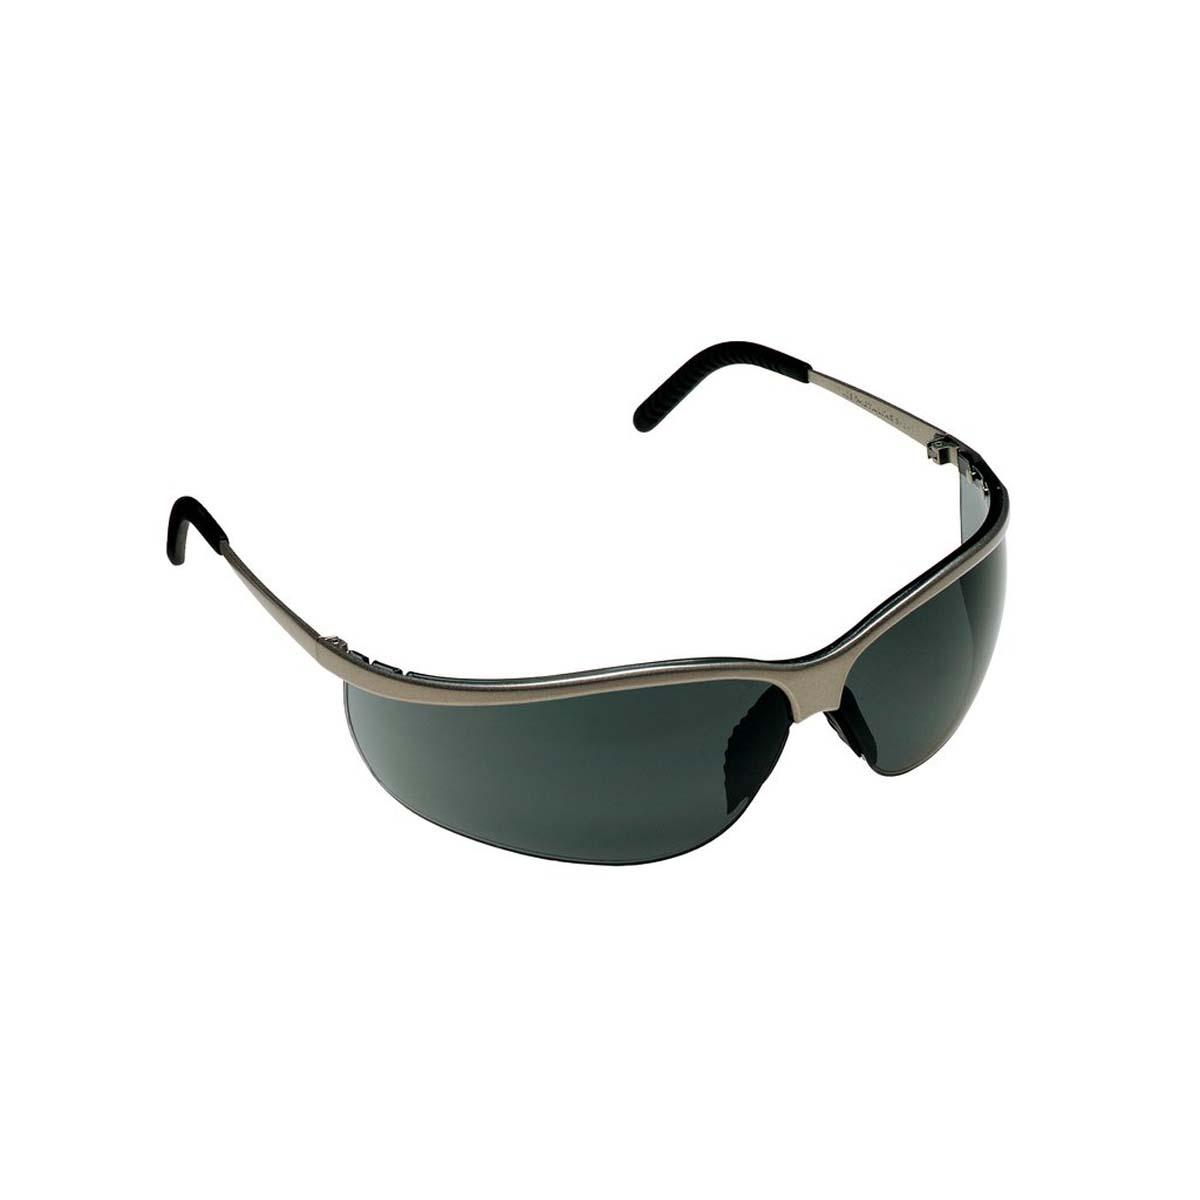 "3Mâ""¢ Metaliksâ""¢ Sport Protective Eyewear 11344-10000-20 Gray Anti-Fog Lens, Nickel Frame"